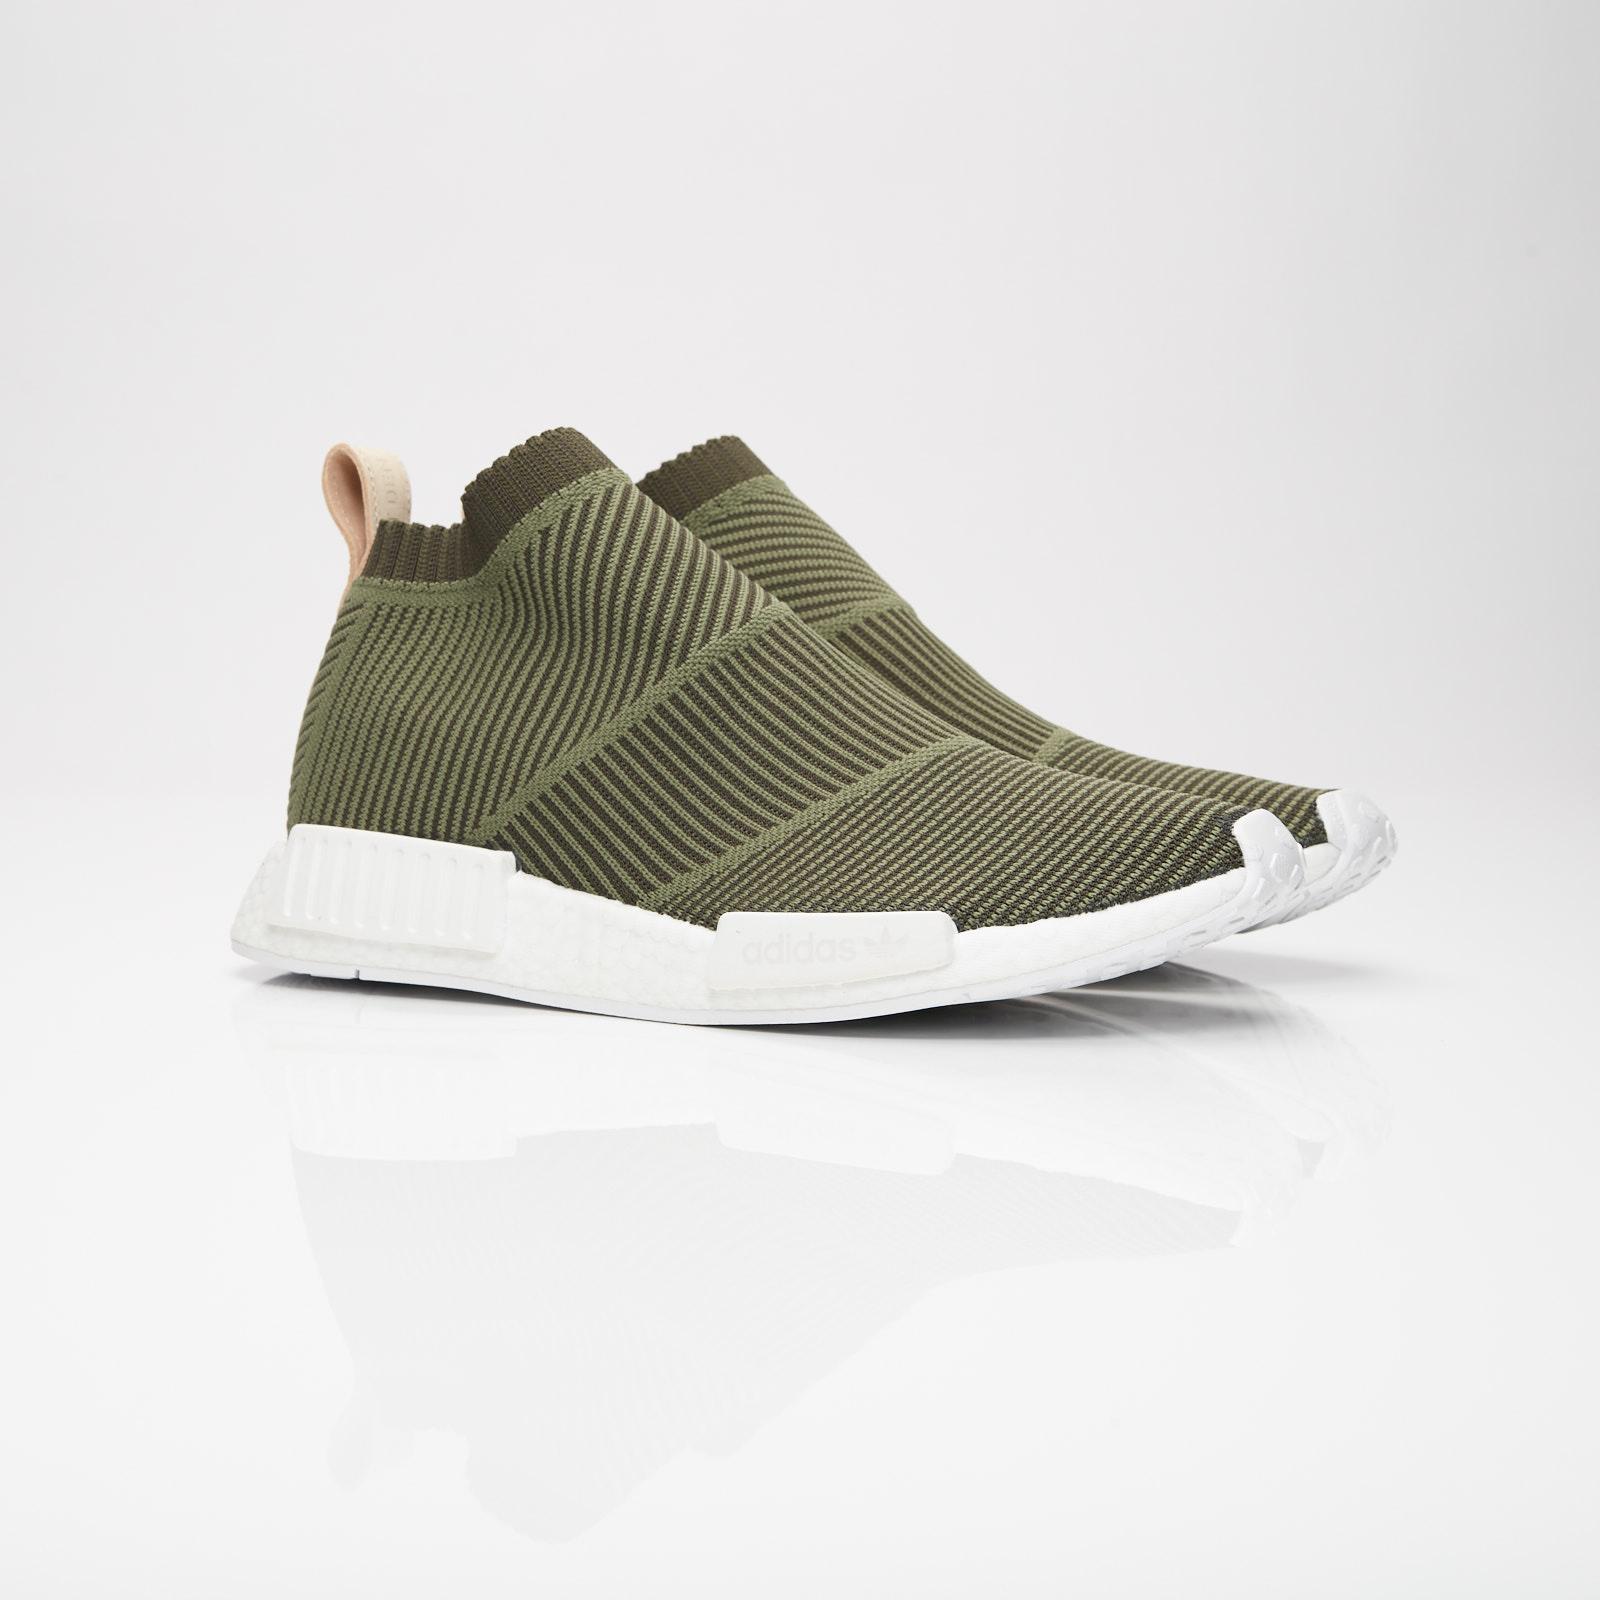 1e79b930f adidas NMD CS1 PK - B37638 - Sneakersnstuff